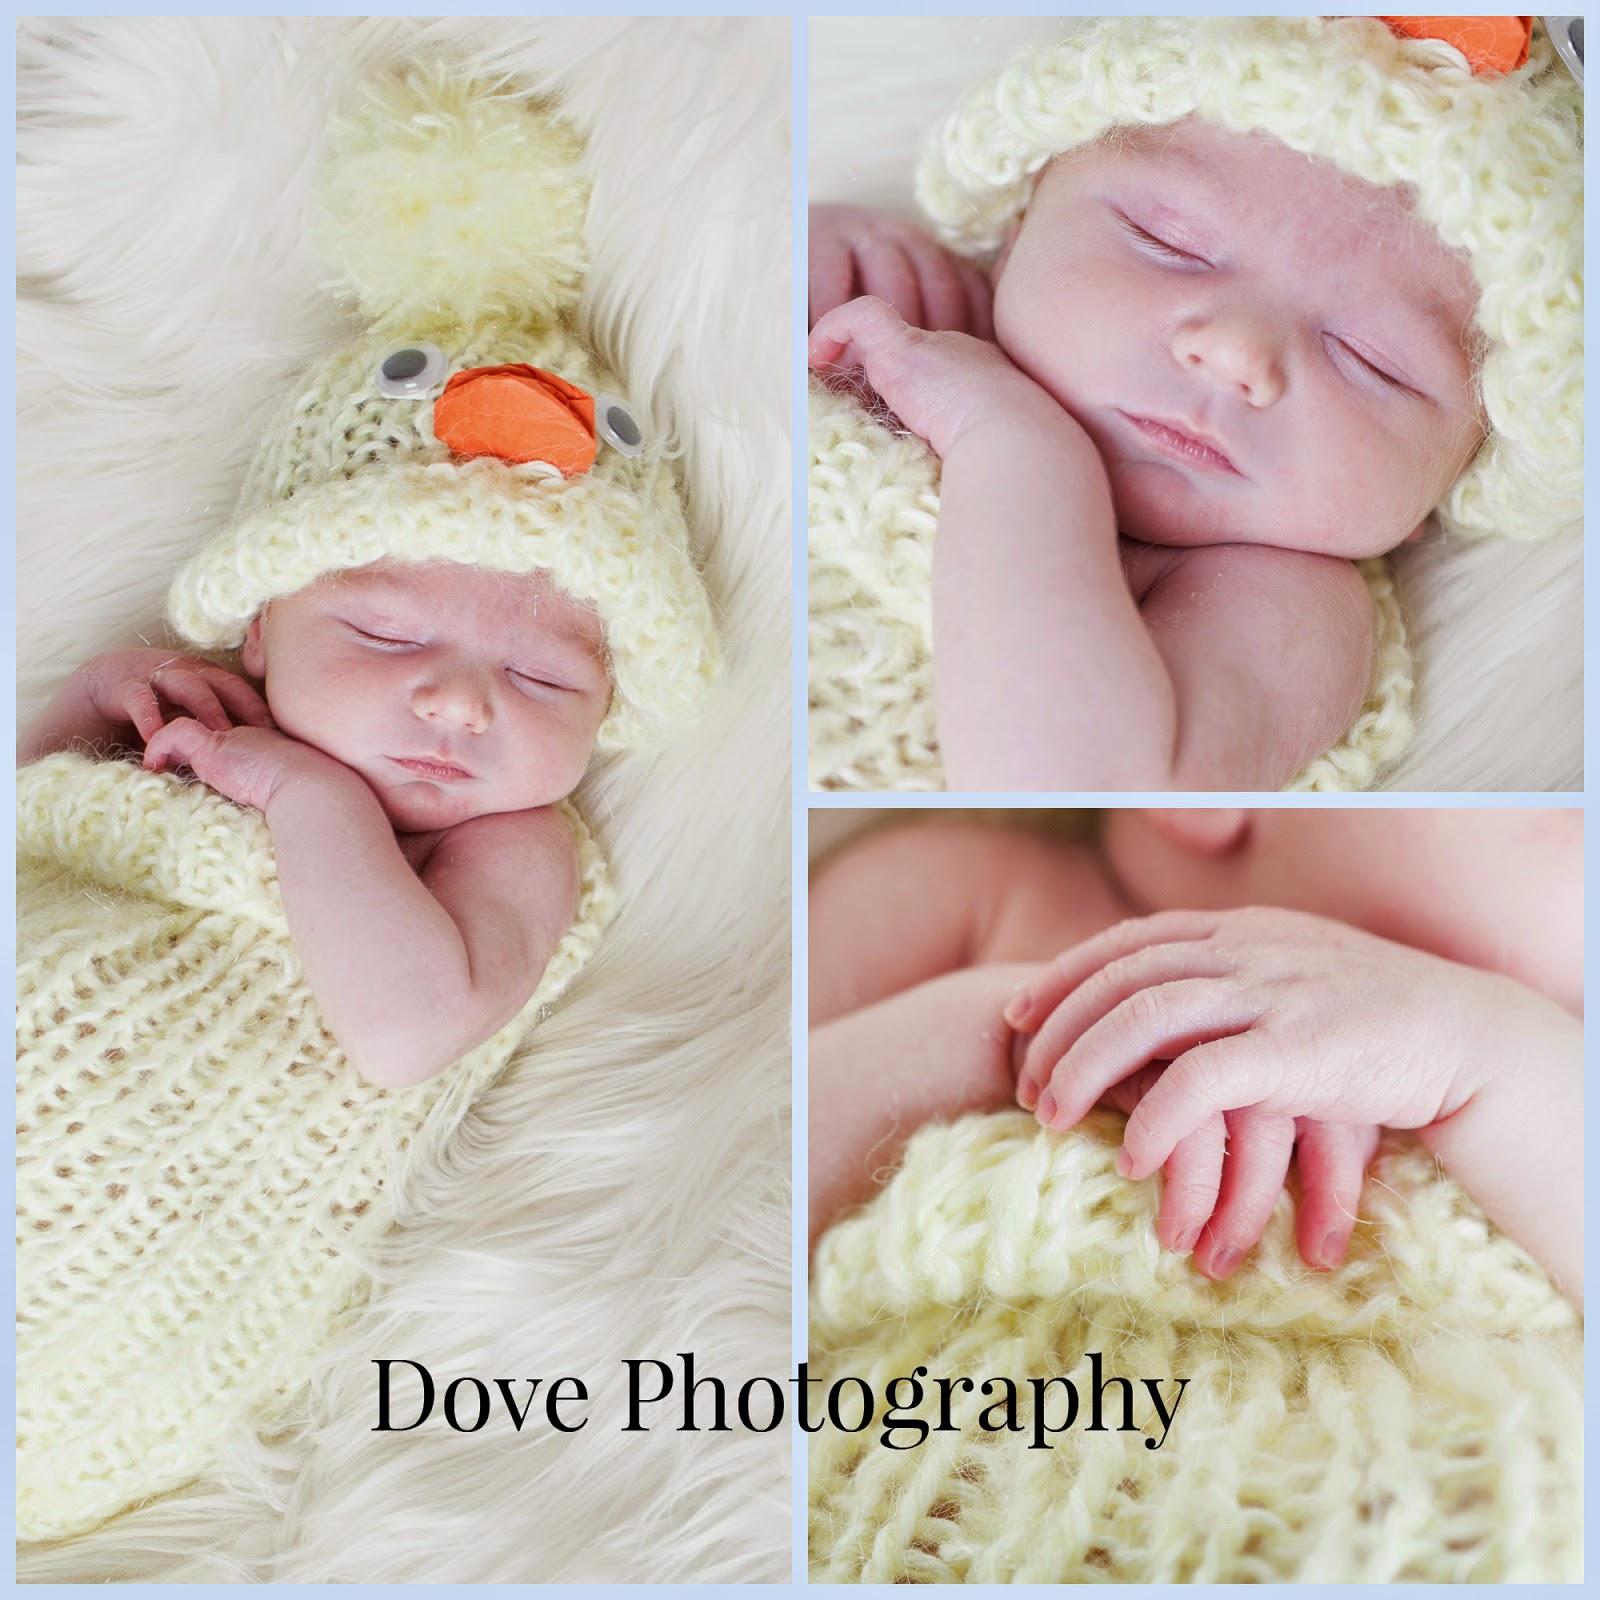 Dove Photography Newborn Photography Blackpool